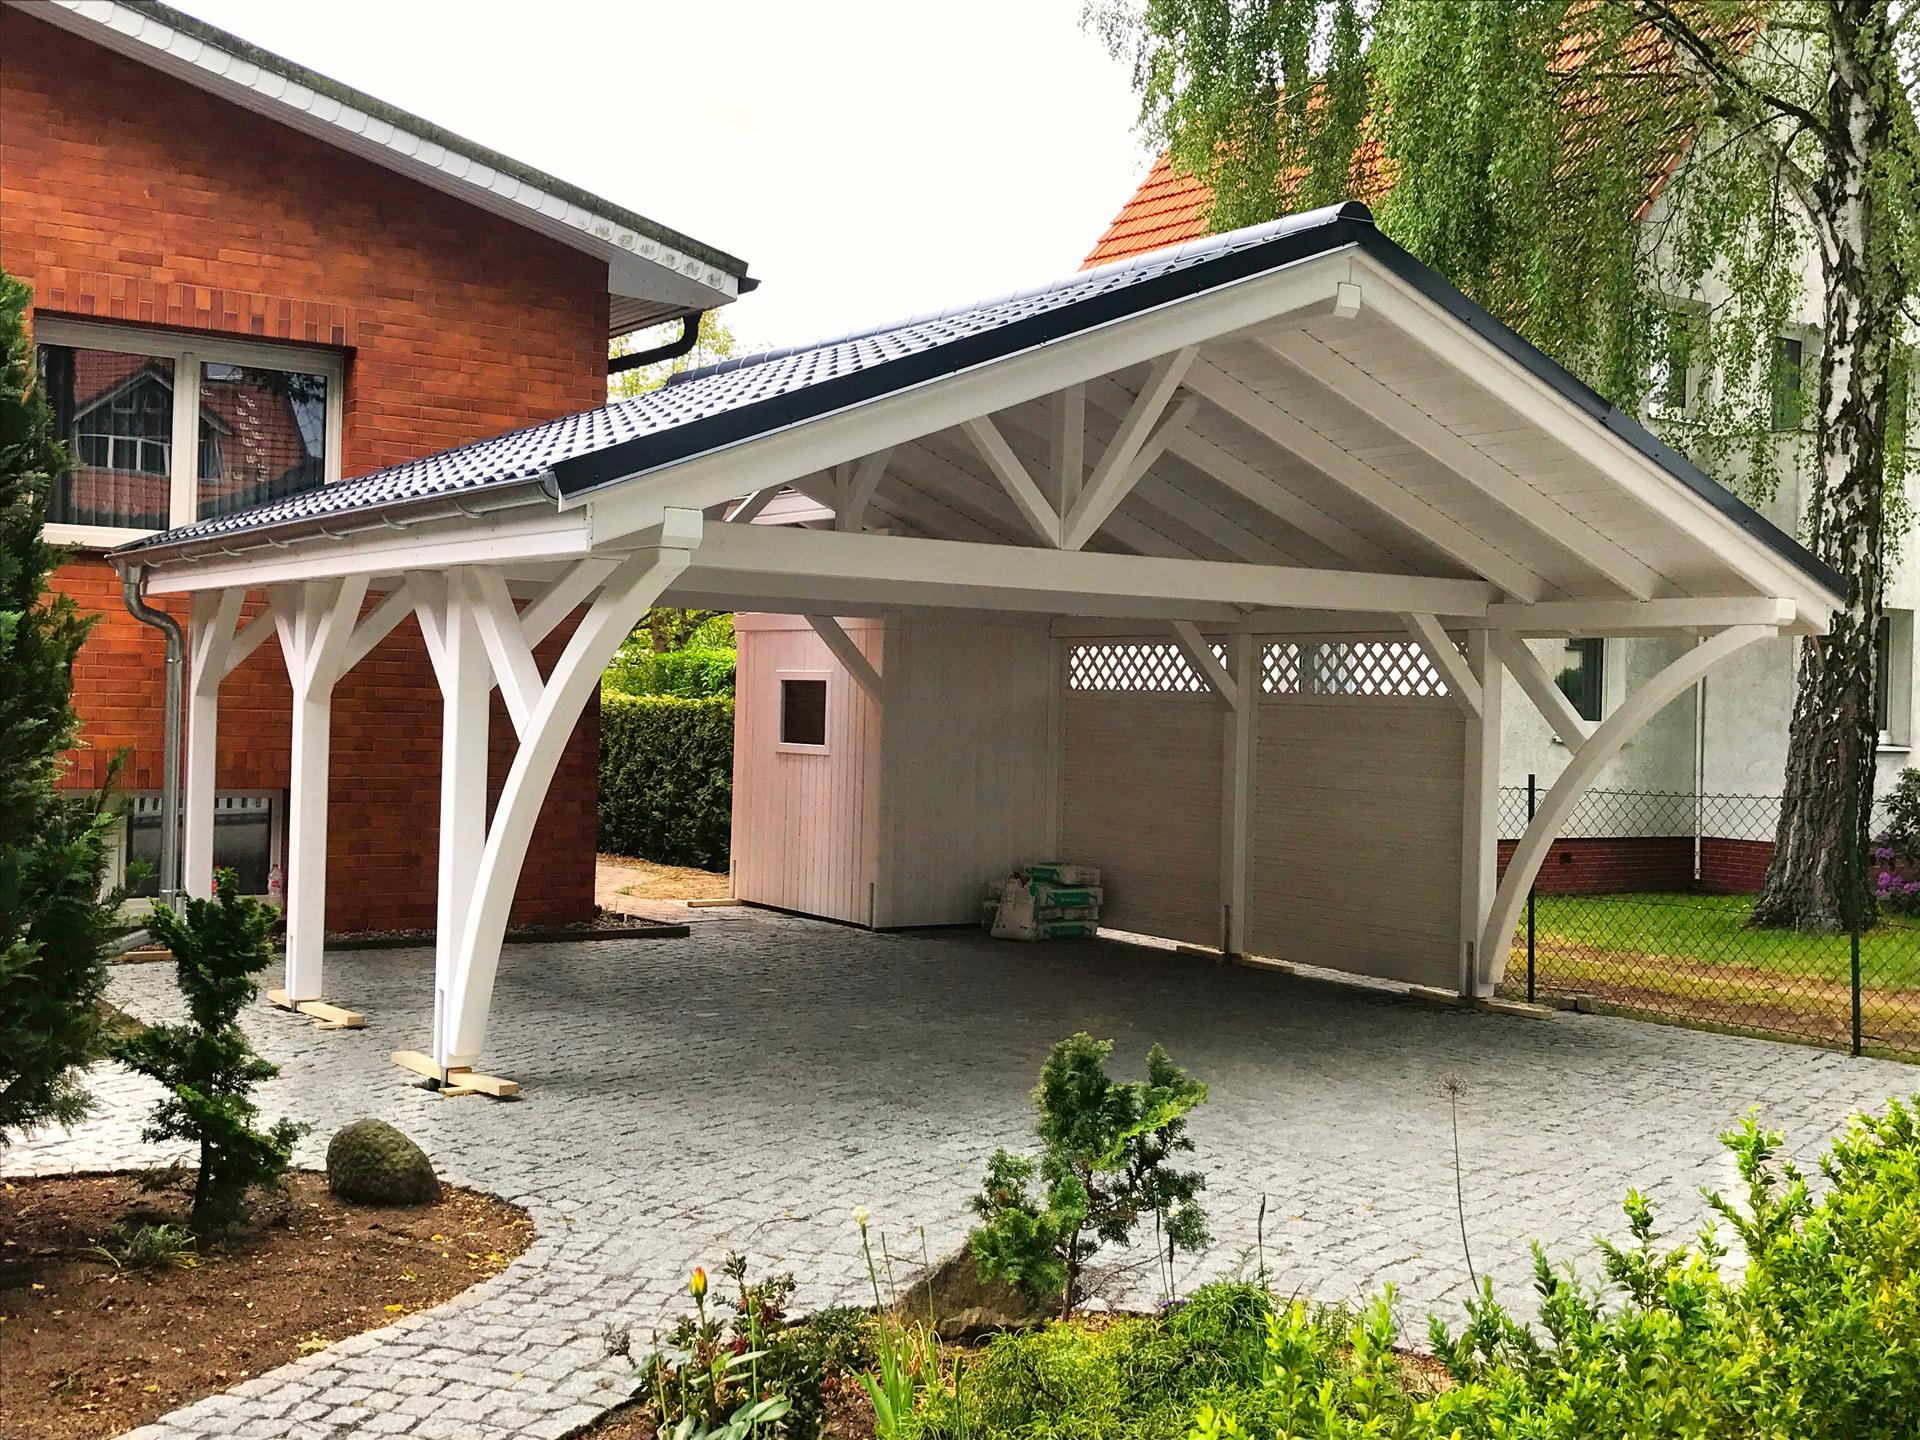 carport aus holz projekte1 main carports aus polen. Black Bedroom Furniture Sets. Home Design Ideas